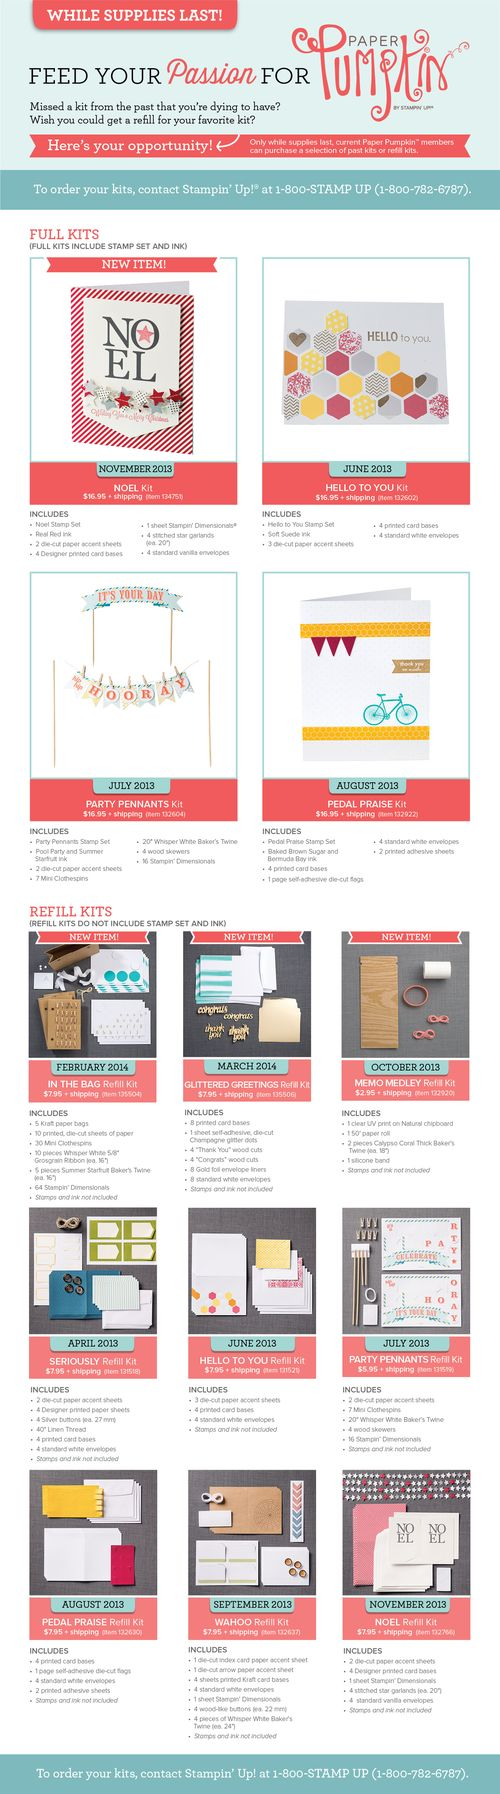 Stampin up paper pumpkin kits on sale